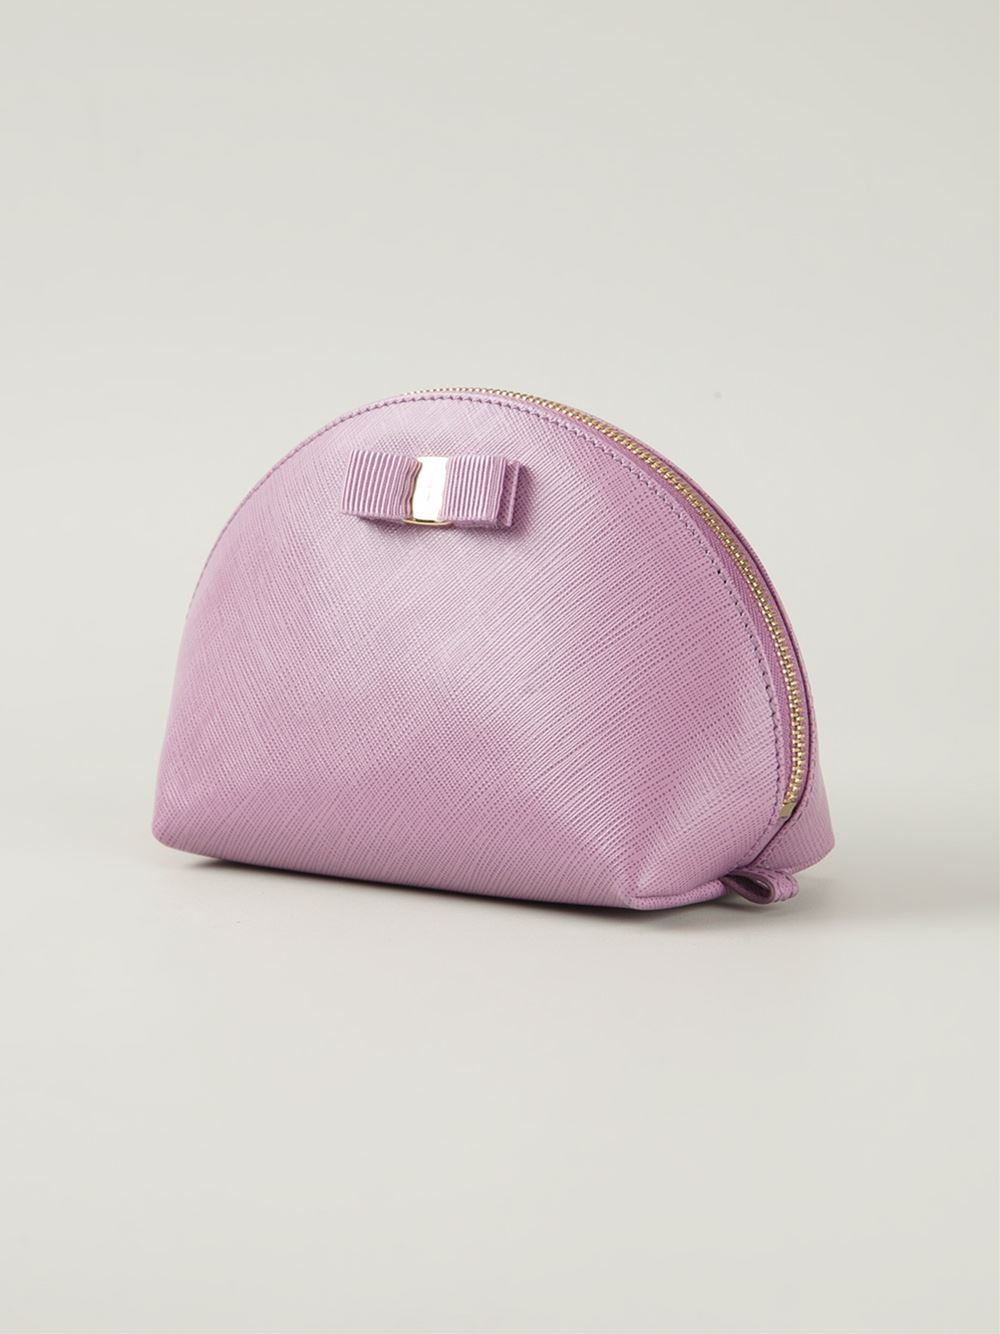 2861e5364c Lyst - Ferragamo  Vara  Bow Makeup Case in Pink